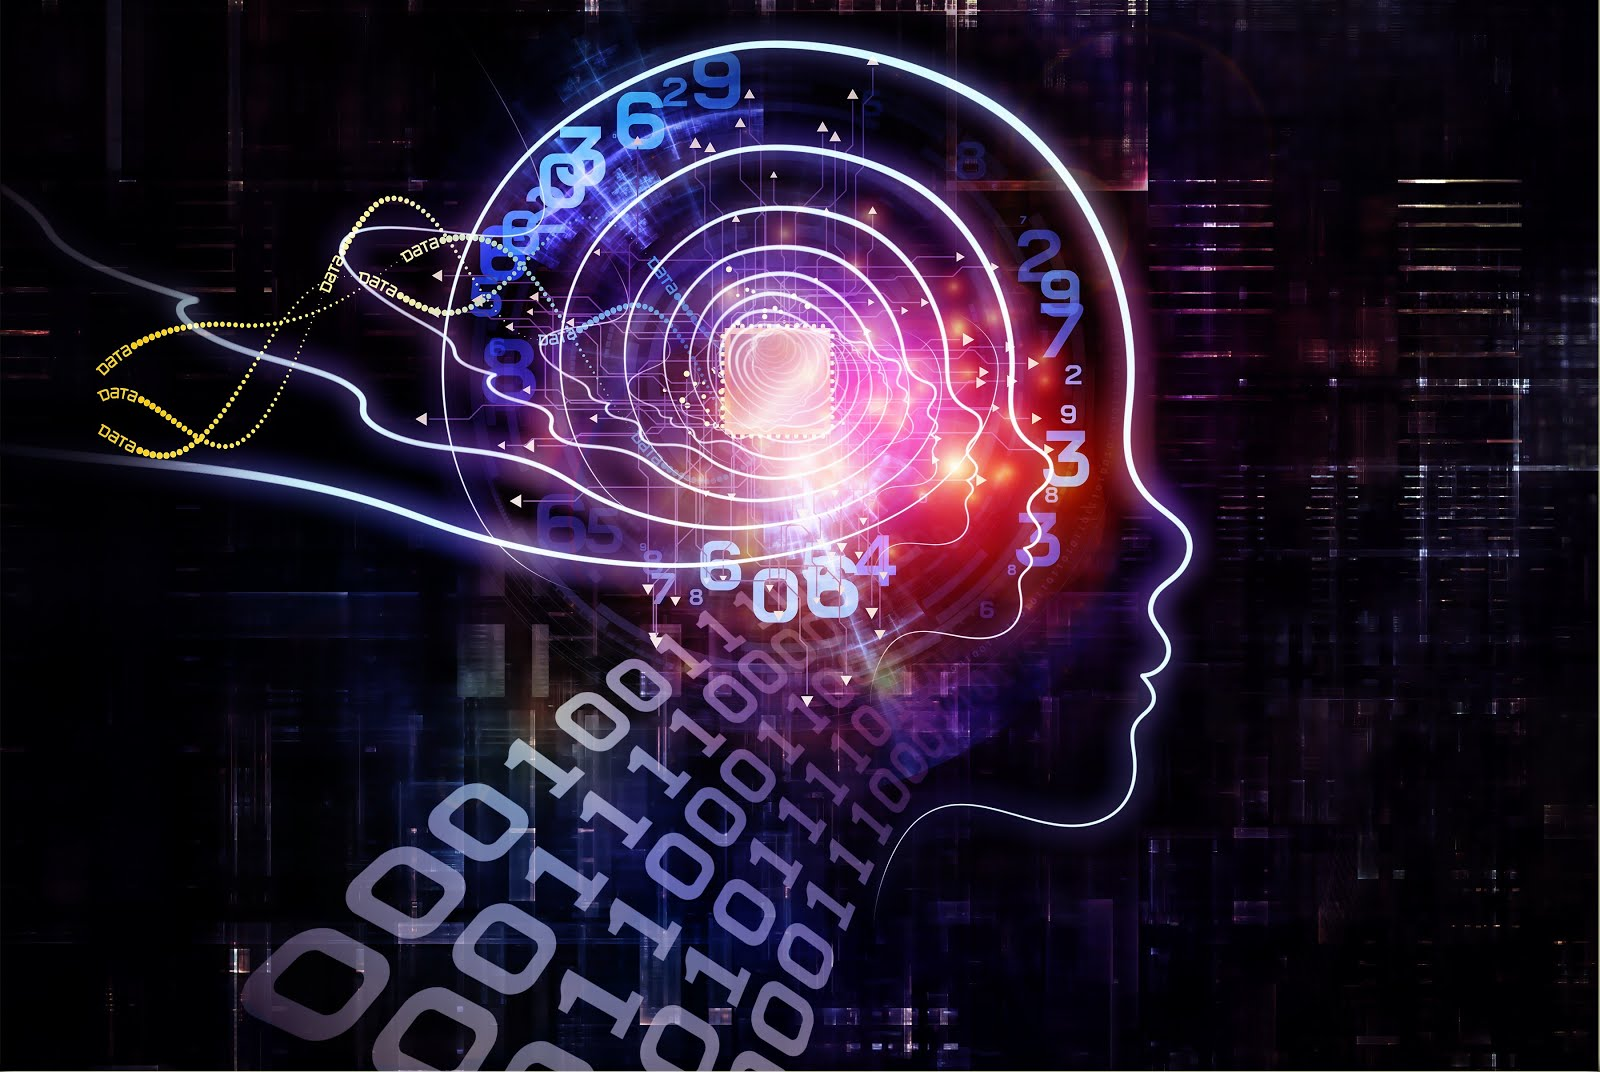 MySpotBlogs: Contoh Sistem Cerdas pada Kehidupan Sehari - hari